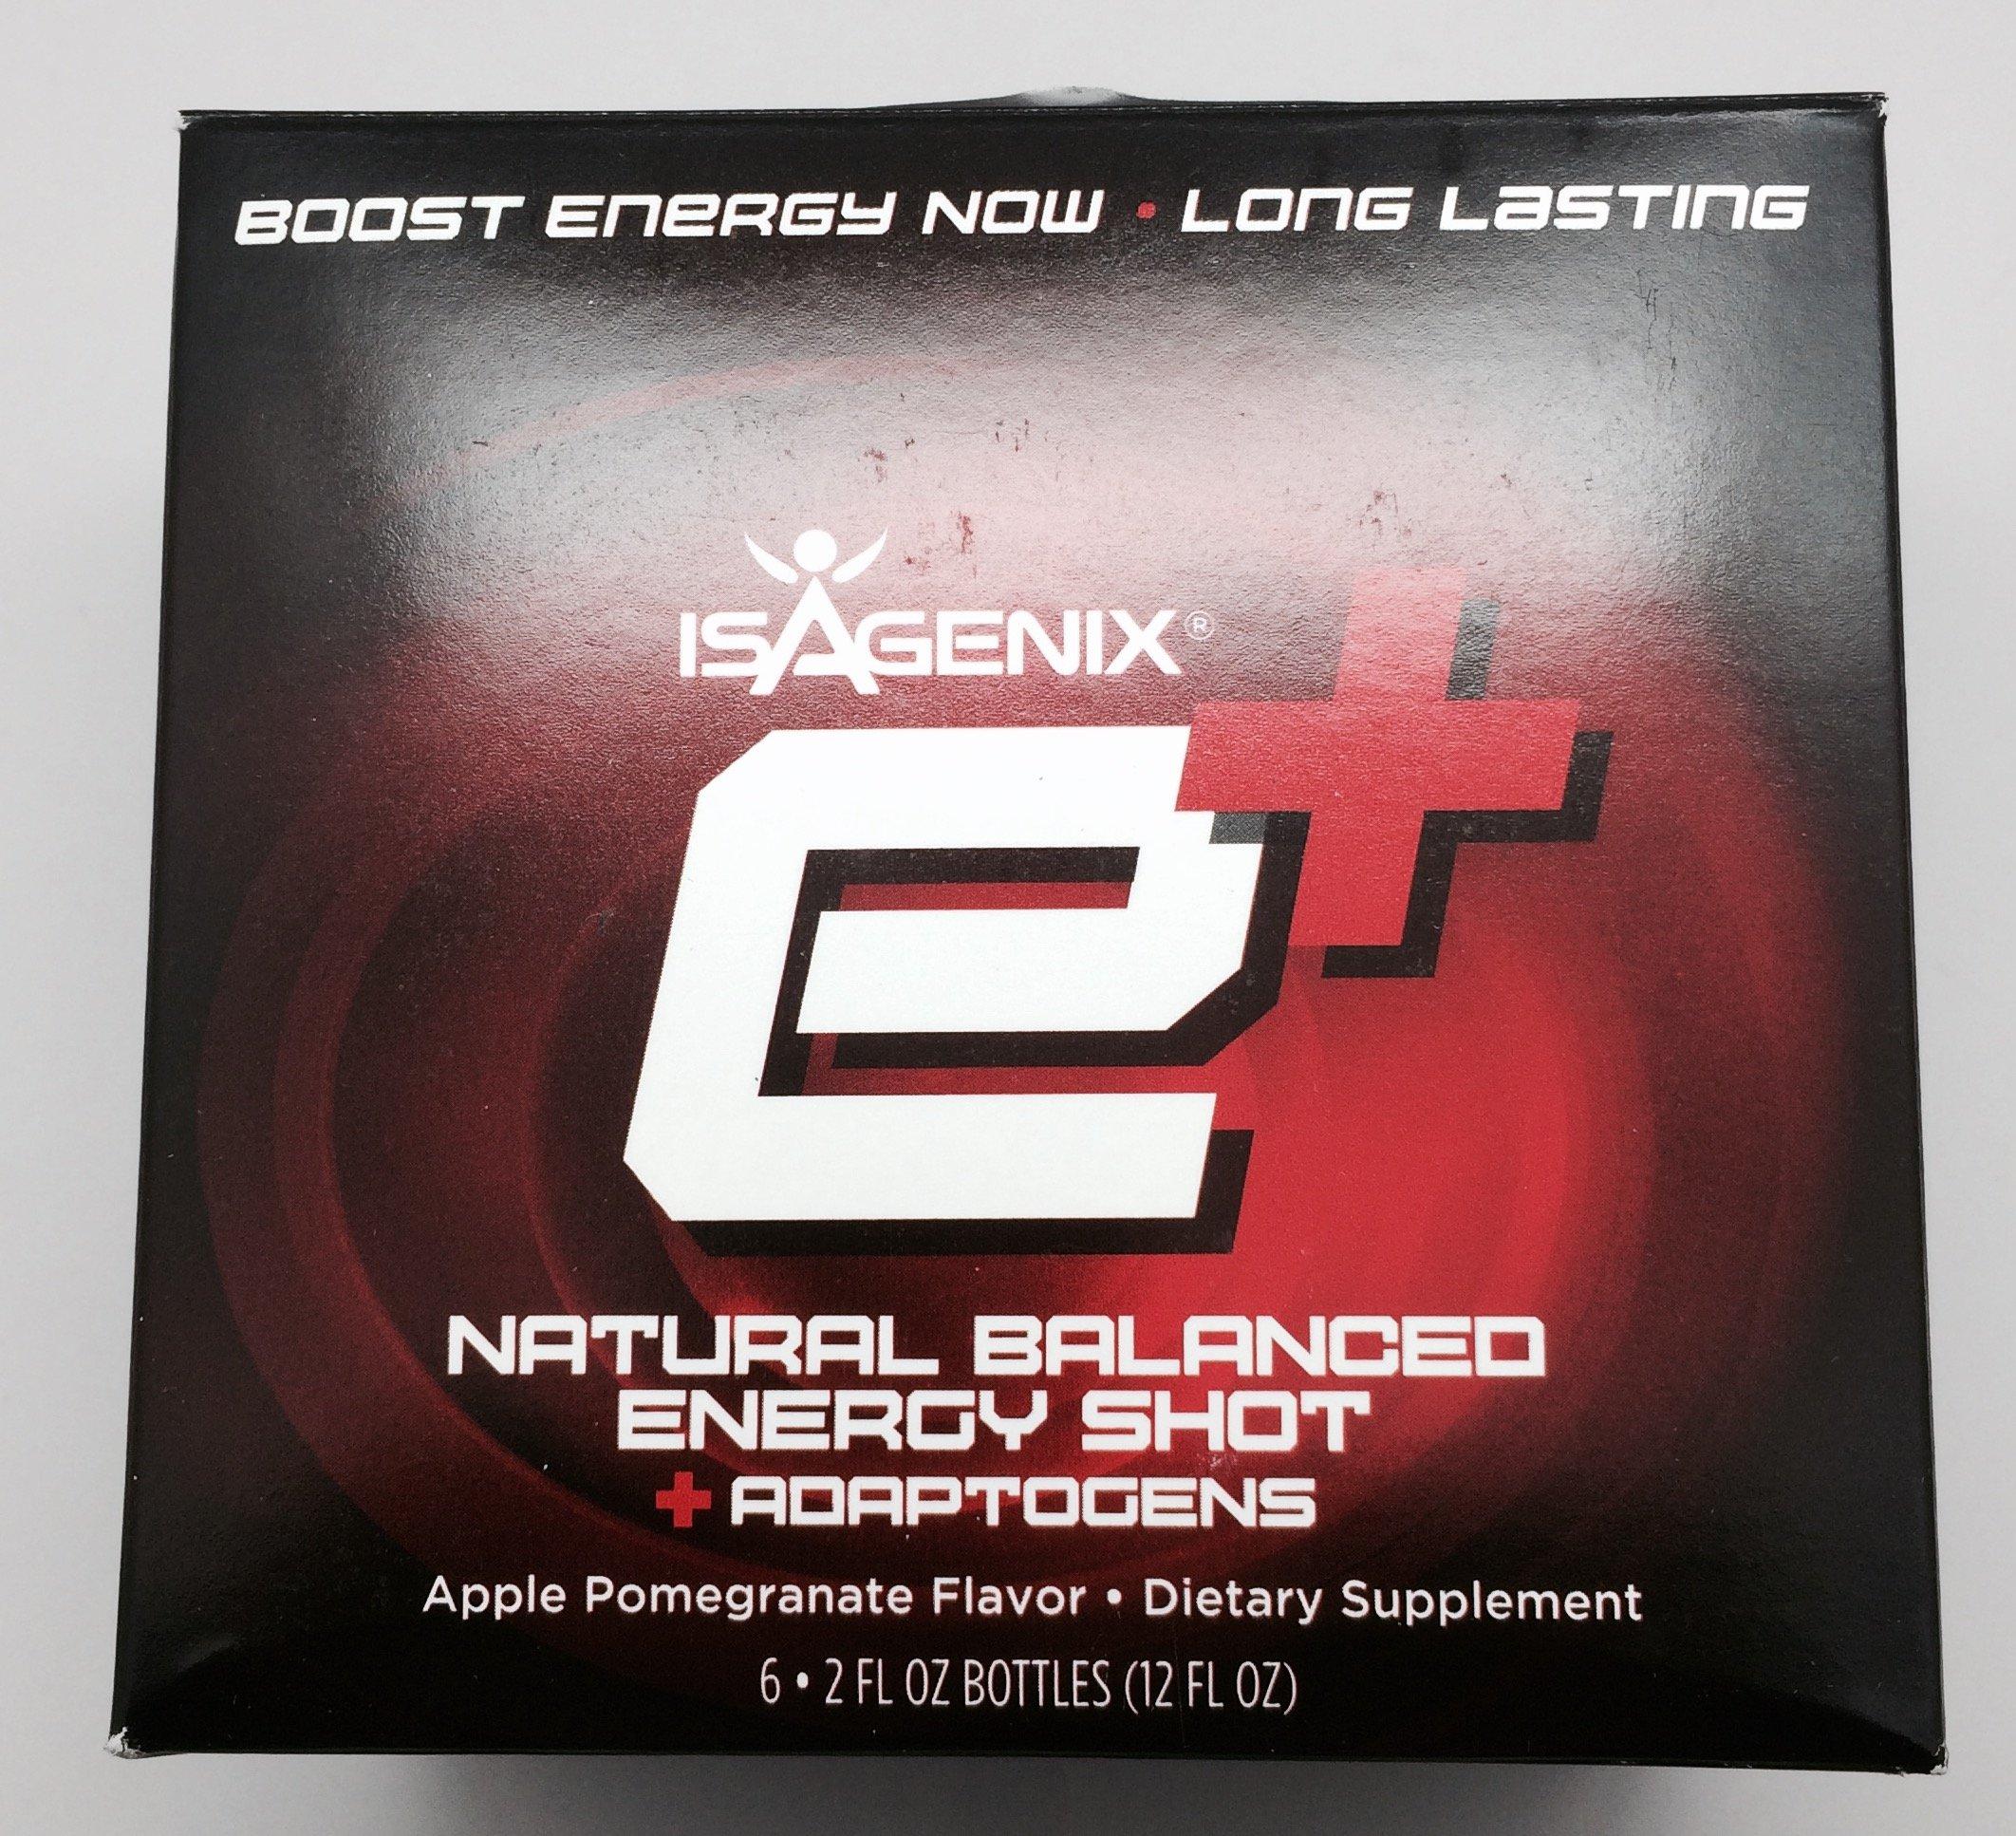 isagenix E+ shot 6-2oz bottles